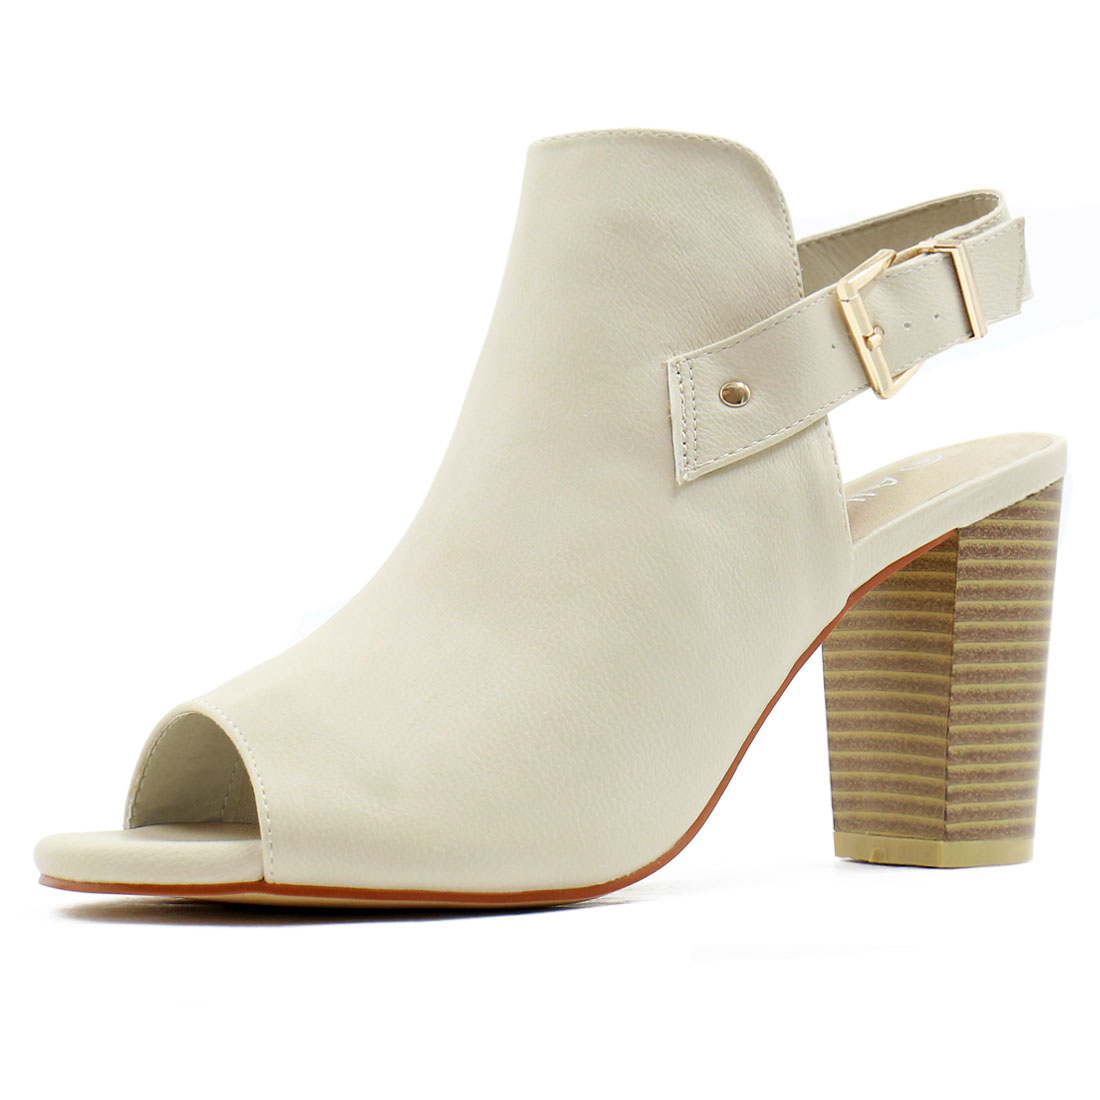 Women Peep Toe Slip On Stacked Heel Slingback Sandals Ivory US 8.5